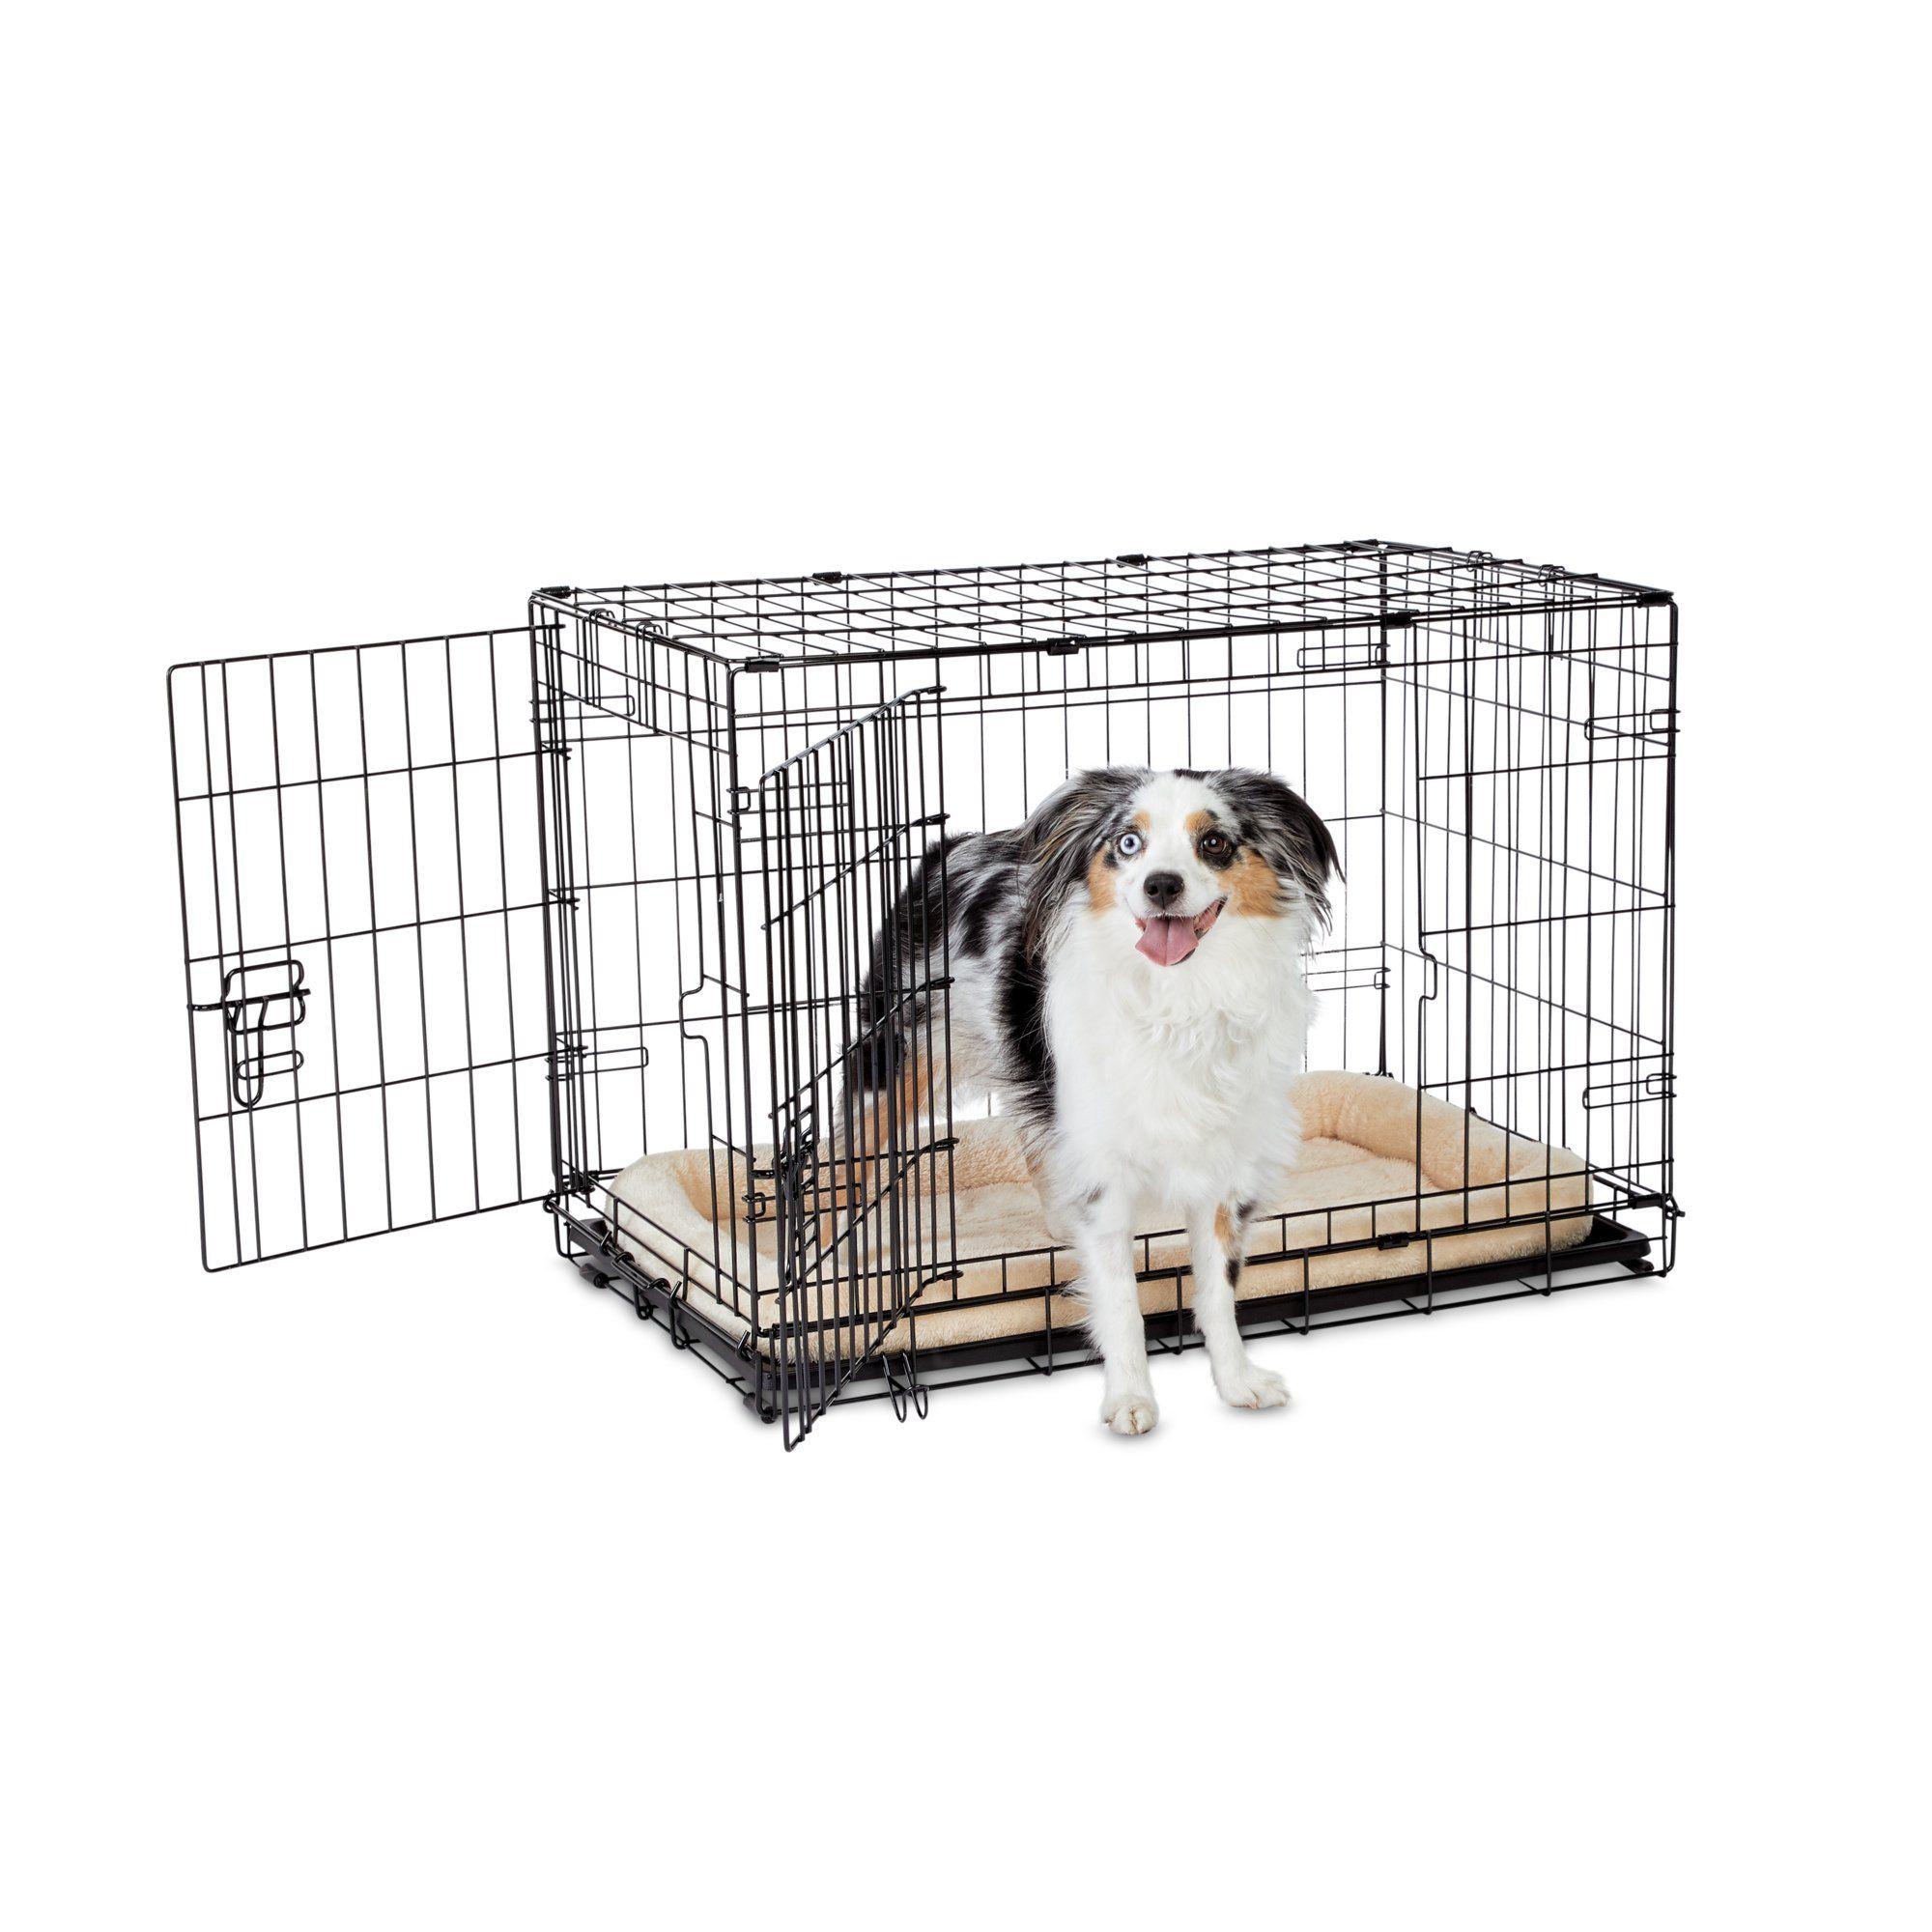 Animaze 2 Door Folding Dog Crate 30 5 L X 19 2 W X 21 5 H Folding Dog Crate Dog Crate Dogs